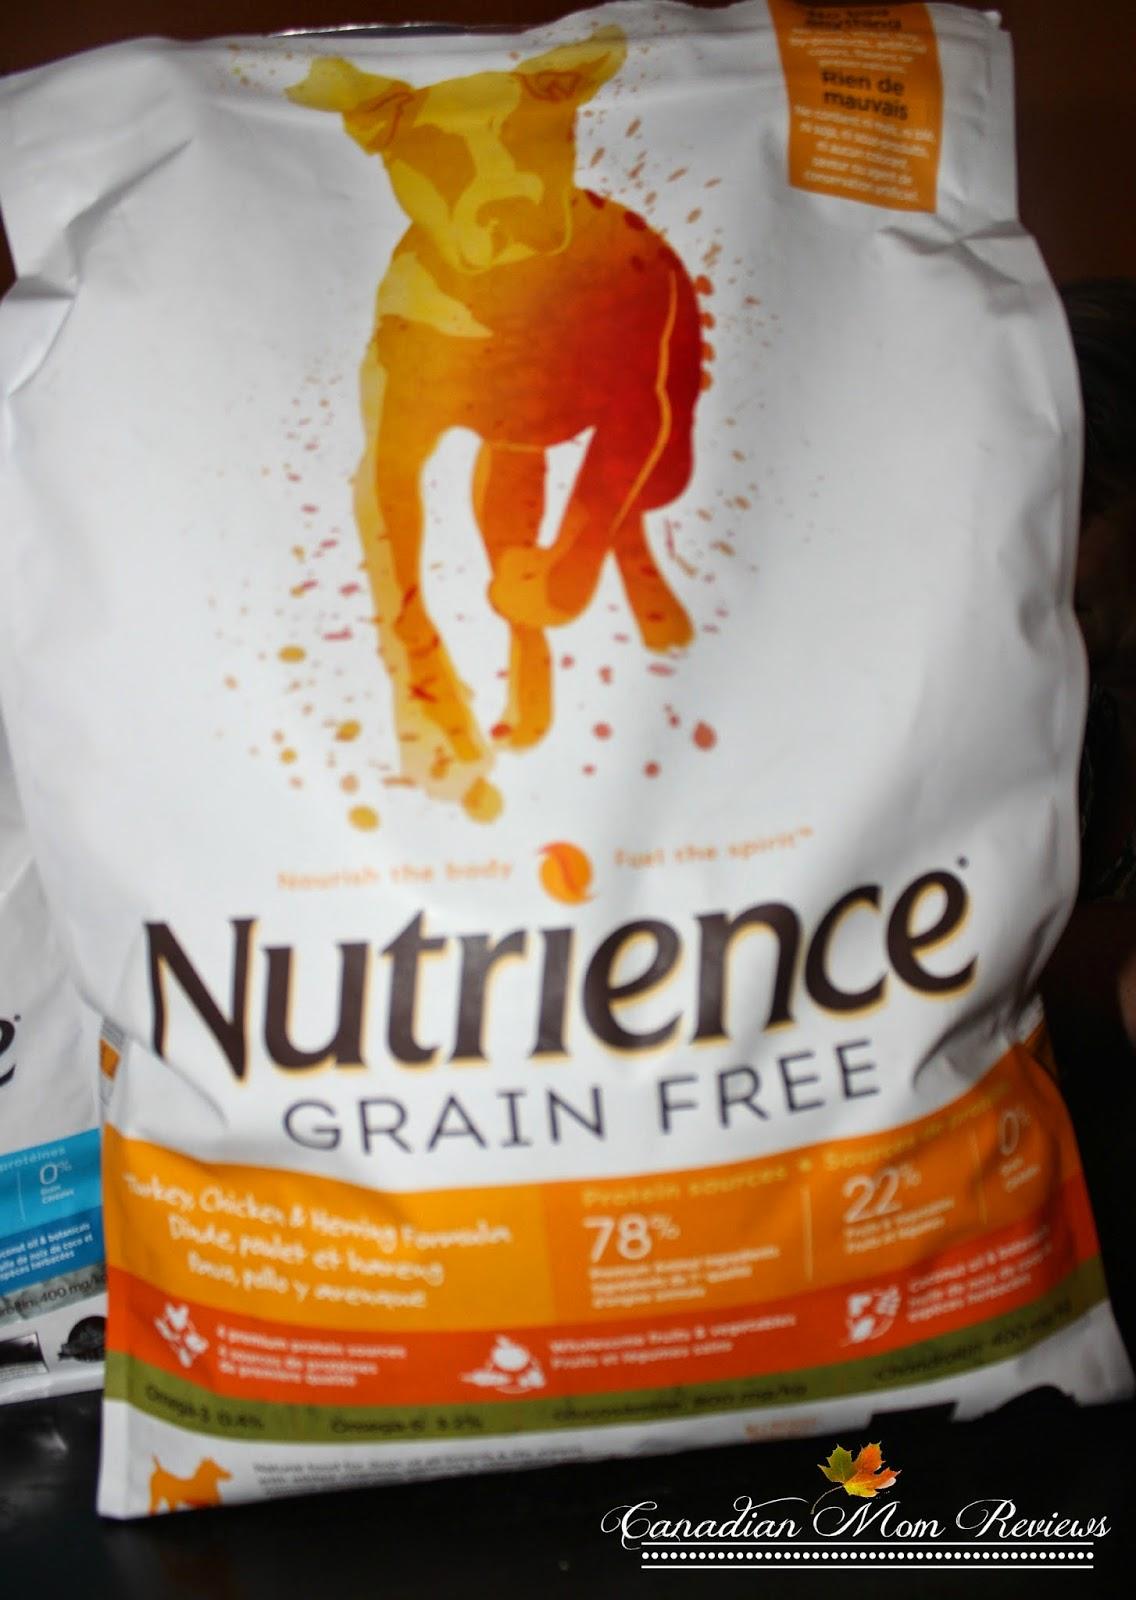 Nutrience Grain Free Dog Food Review